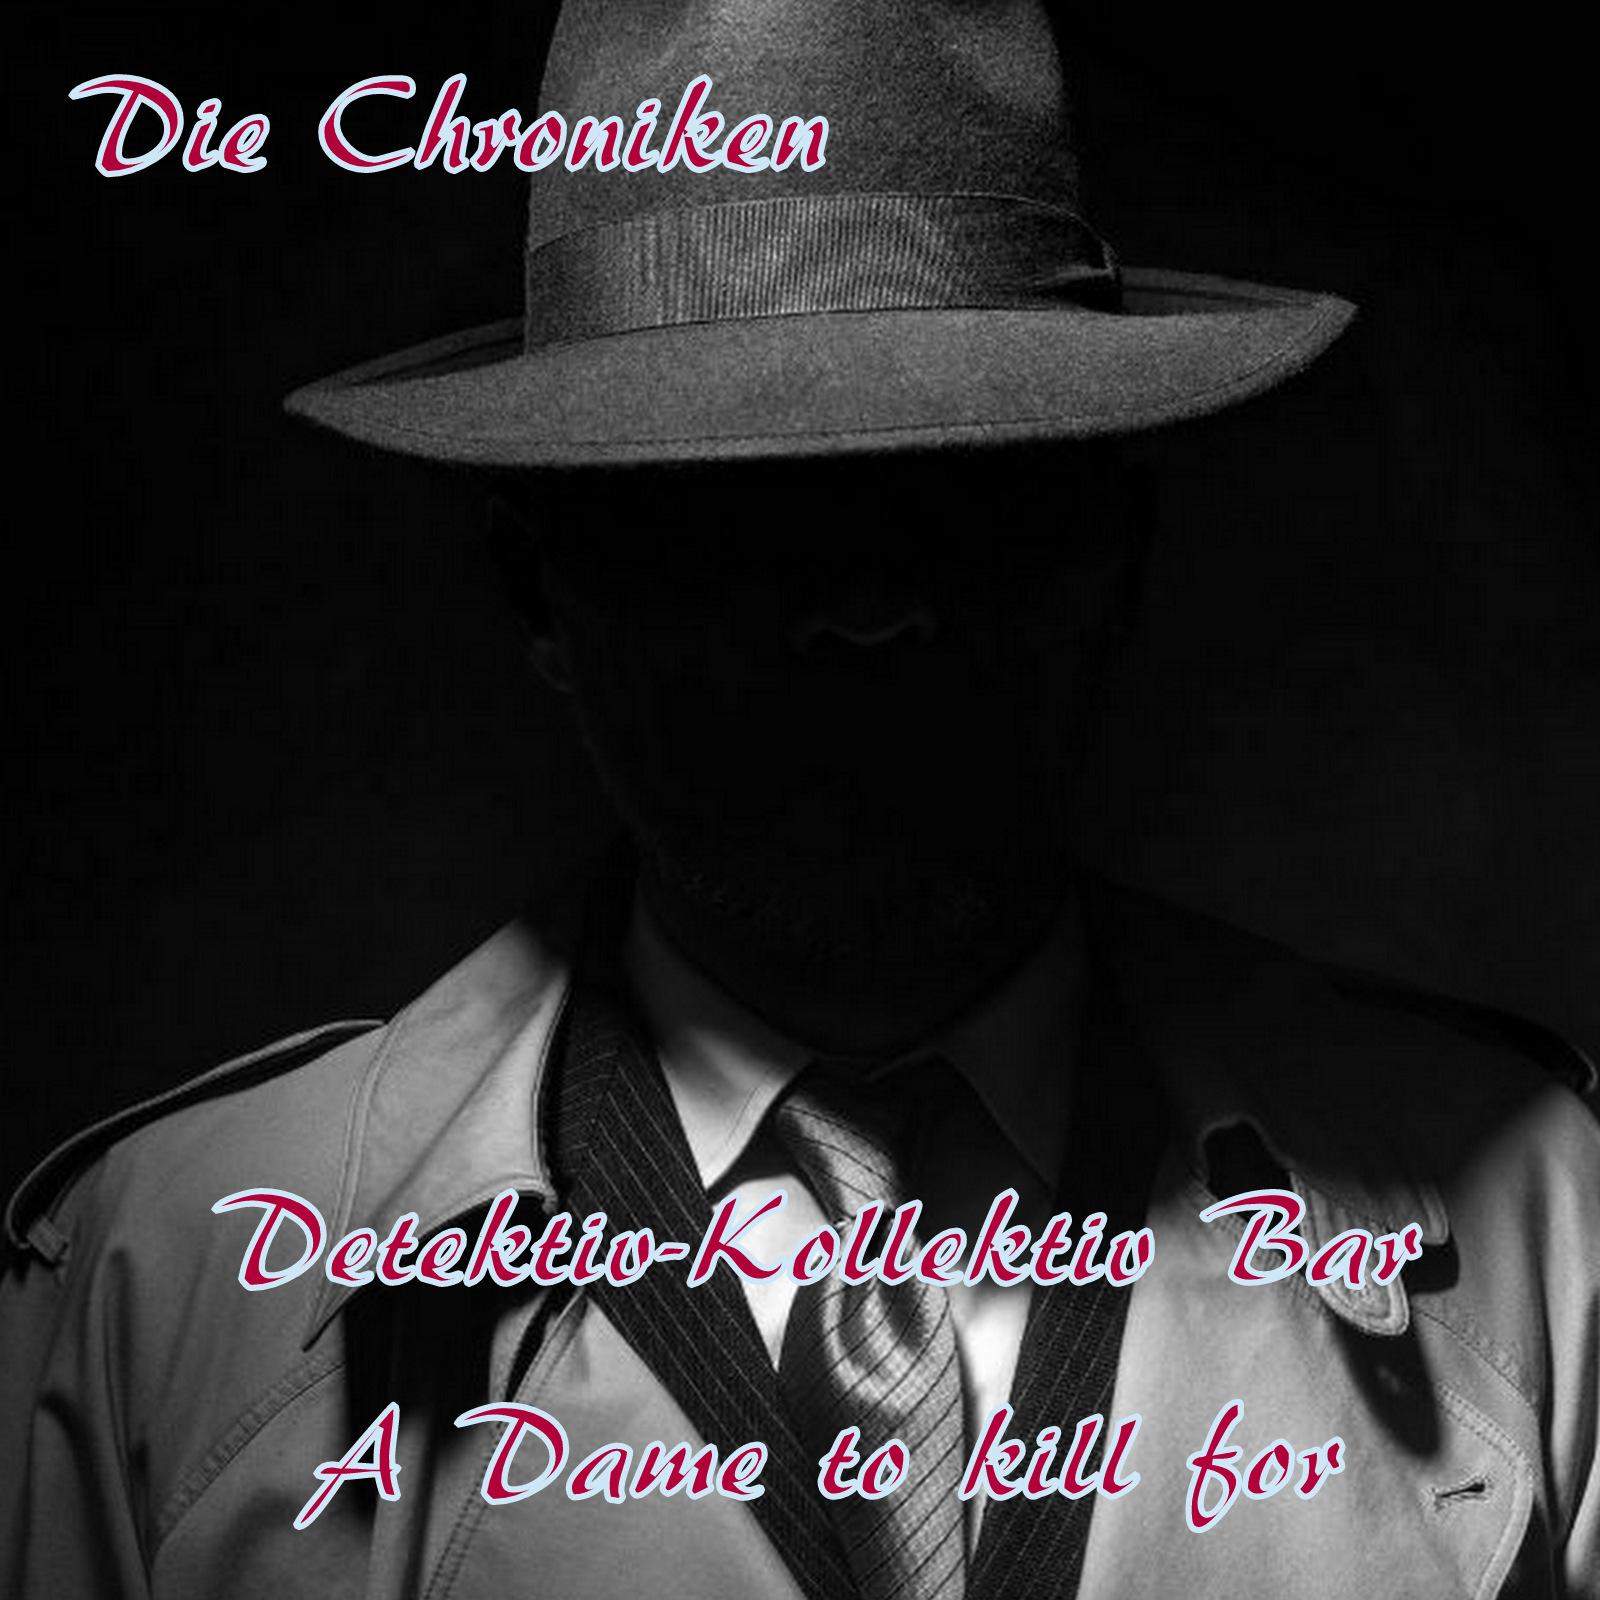 Detektiv-Kollektiv Bar - A Dame to kill for